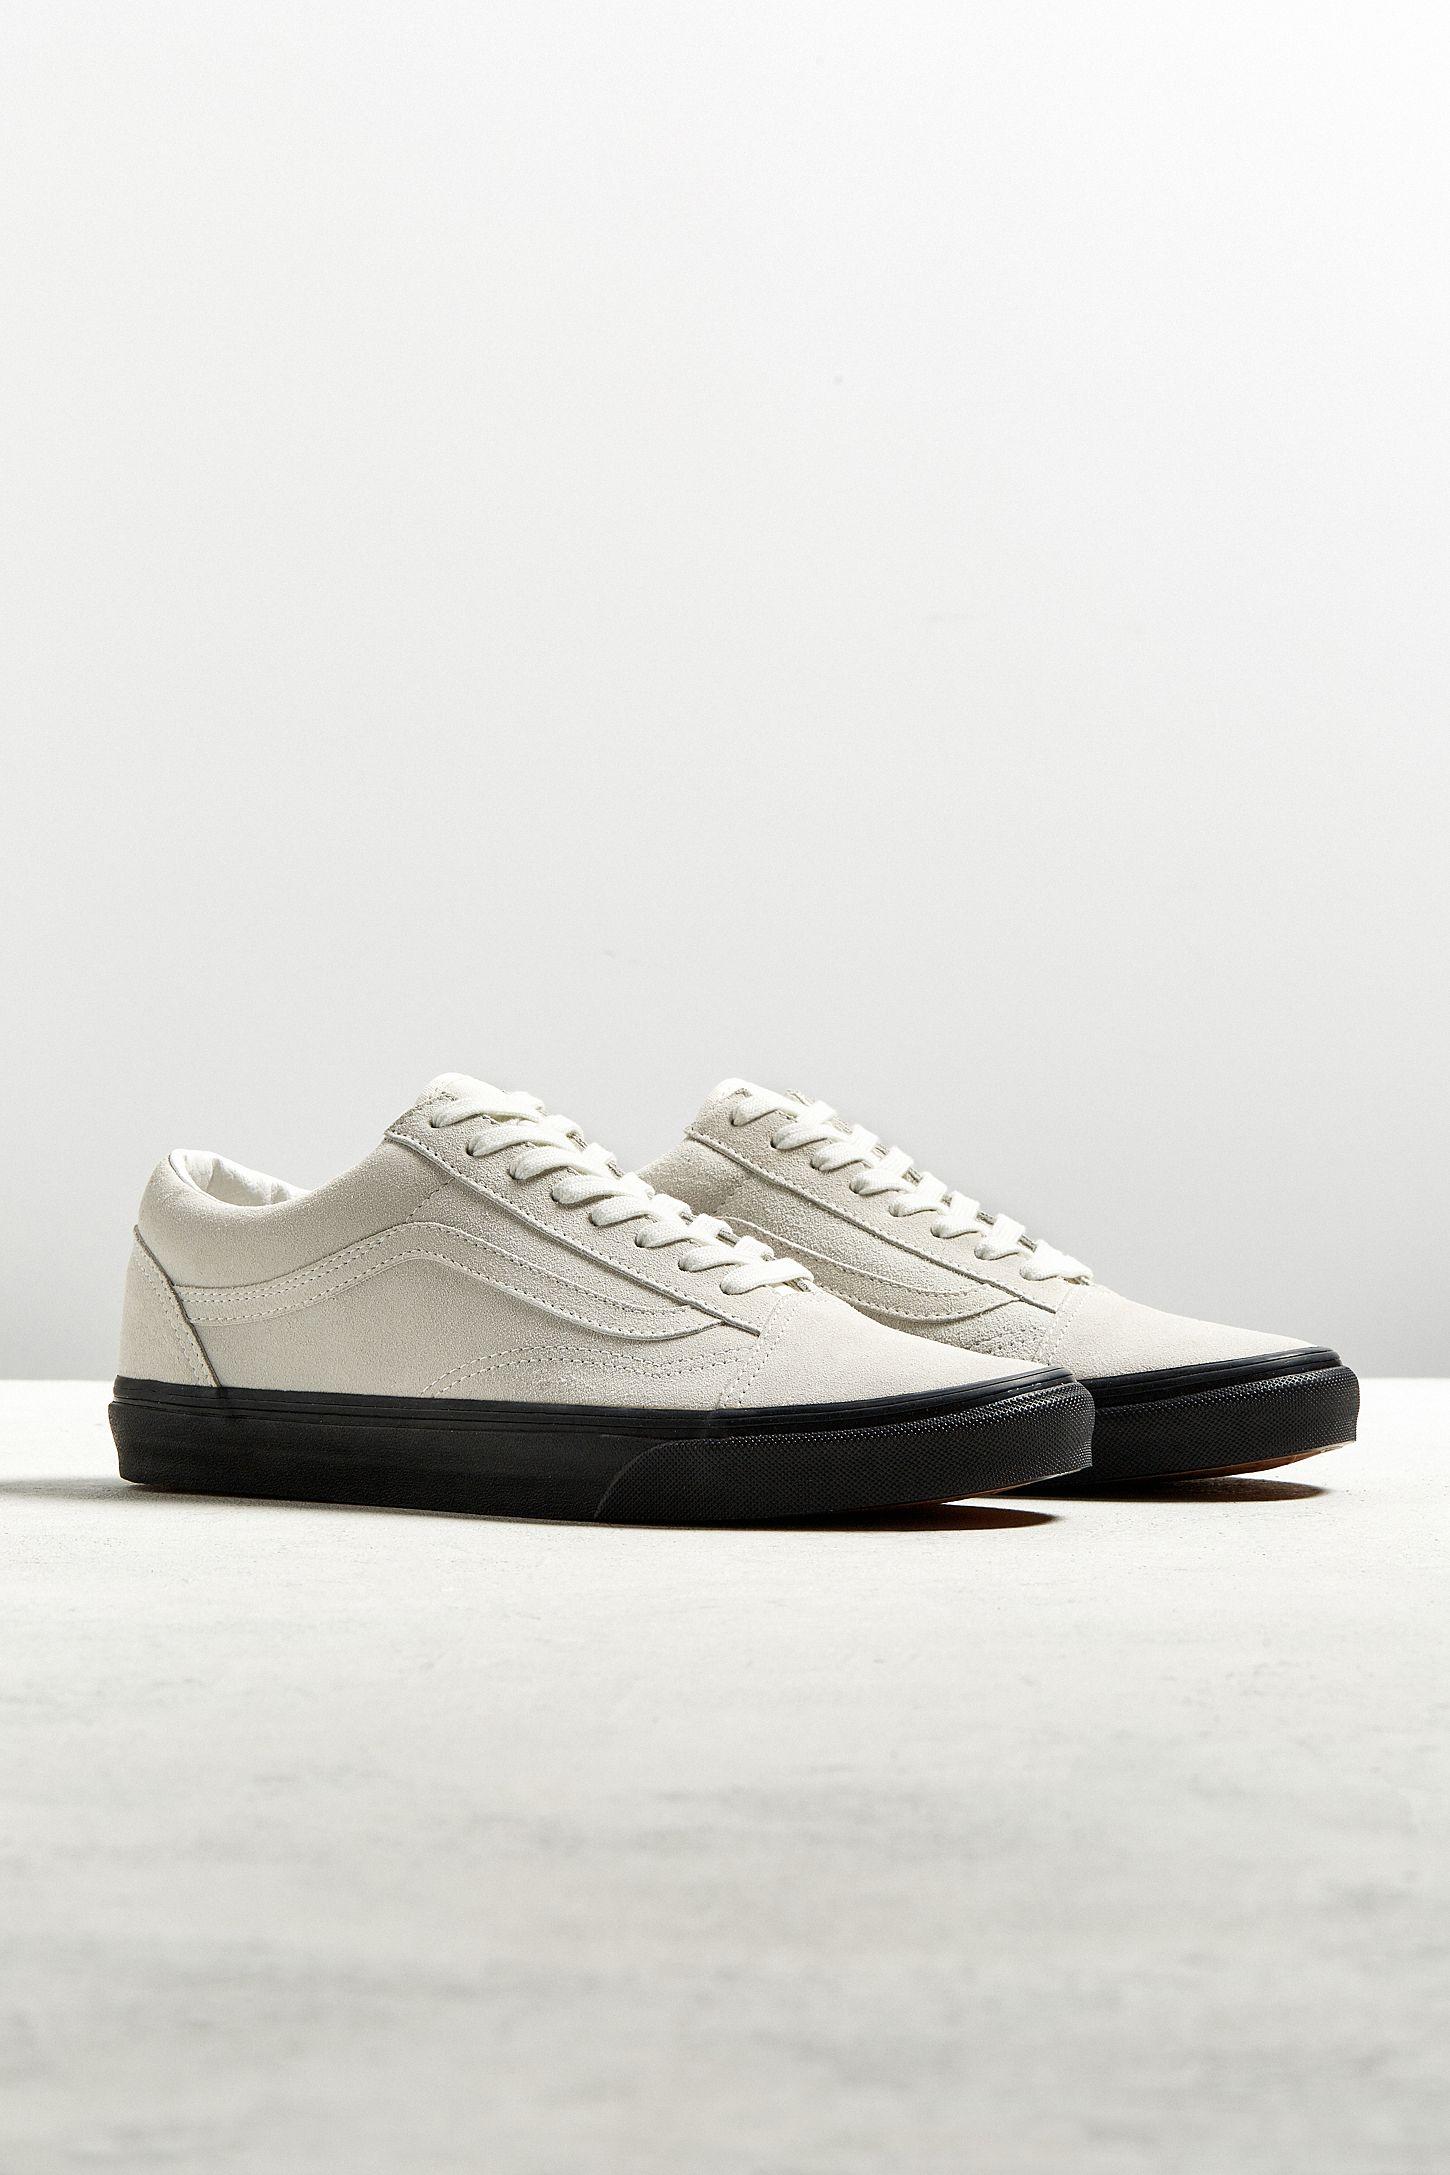 44a6a621fe6090 Vans Old Skool Black Sole Sneaker